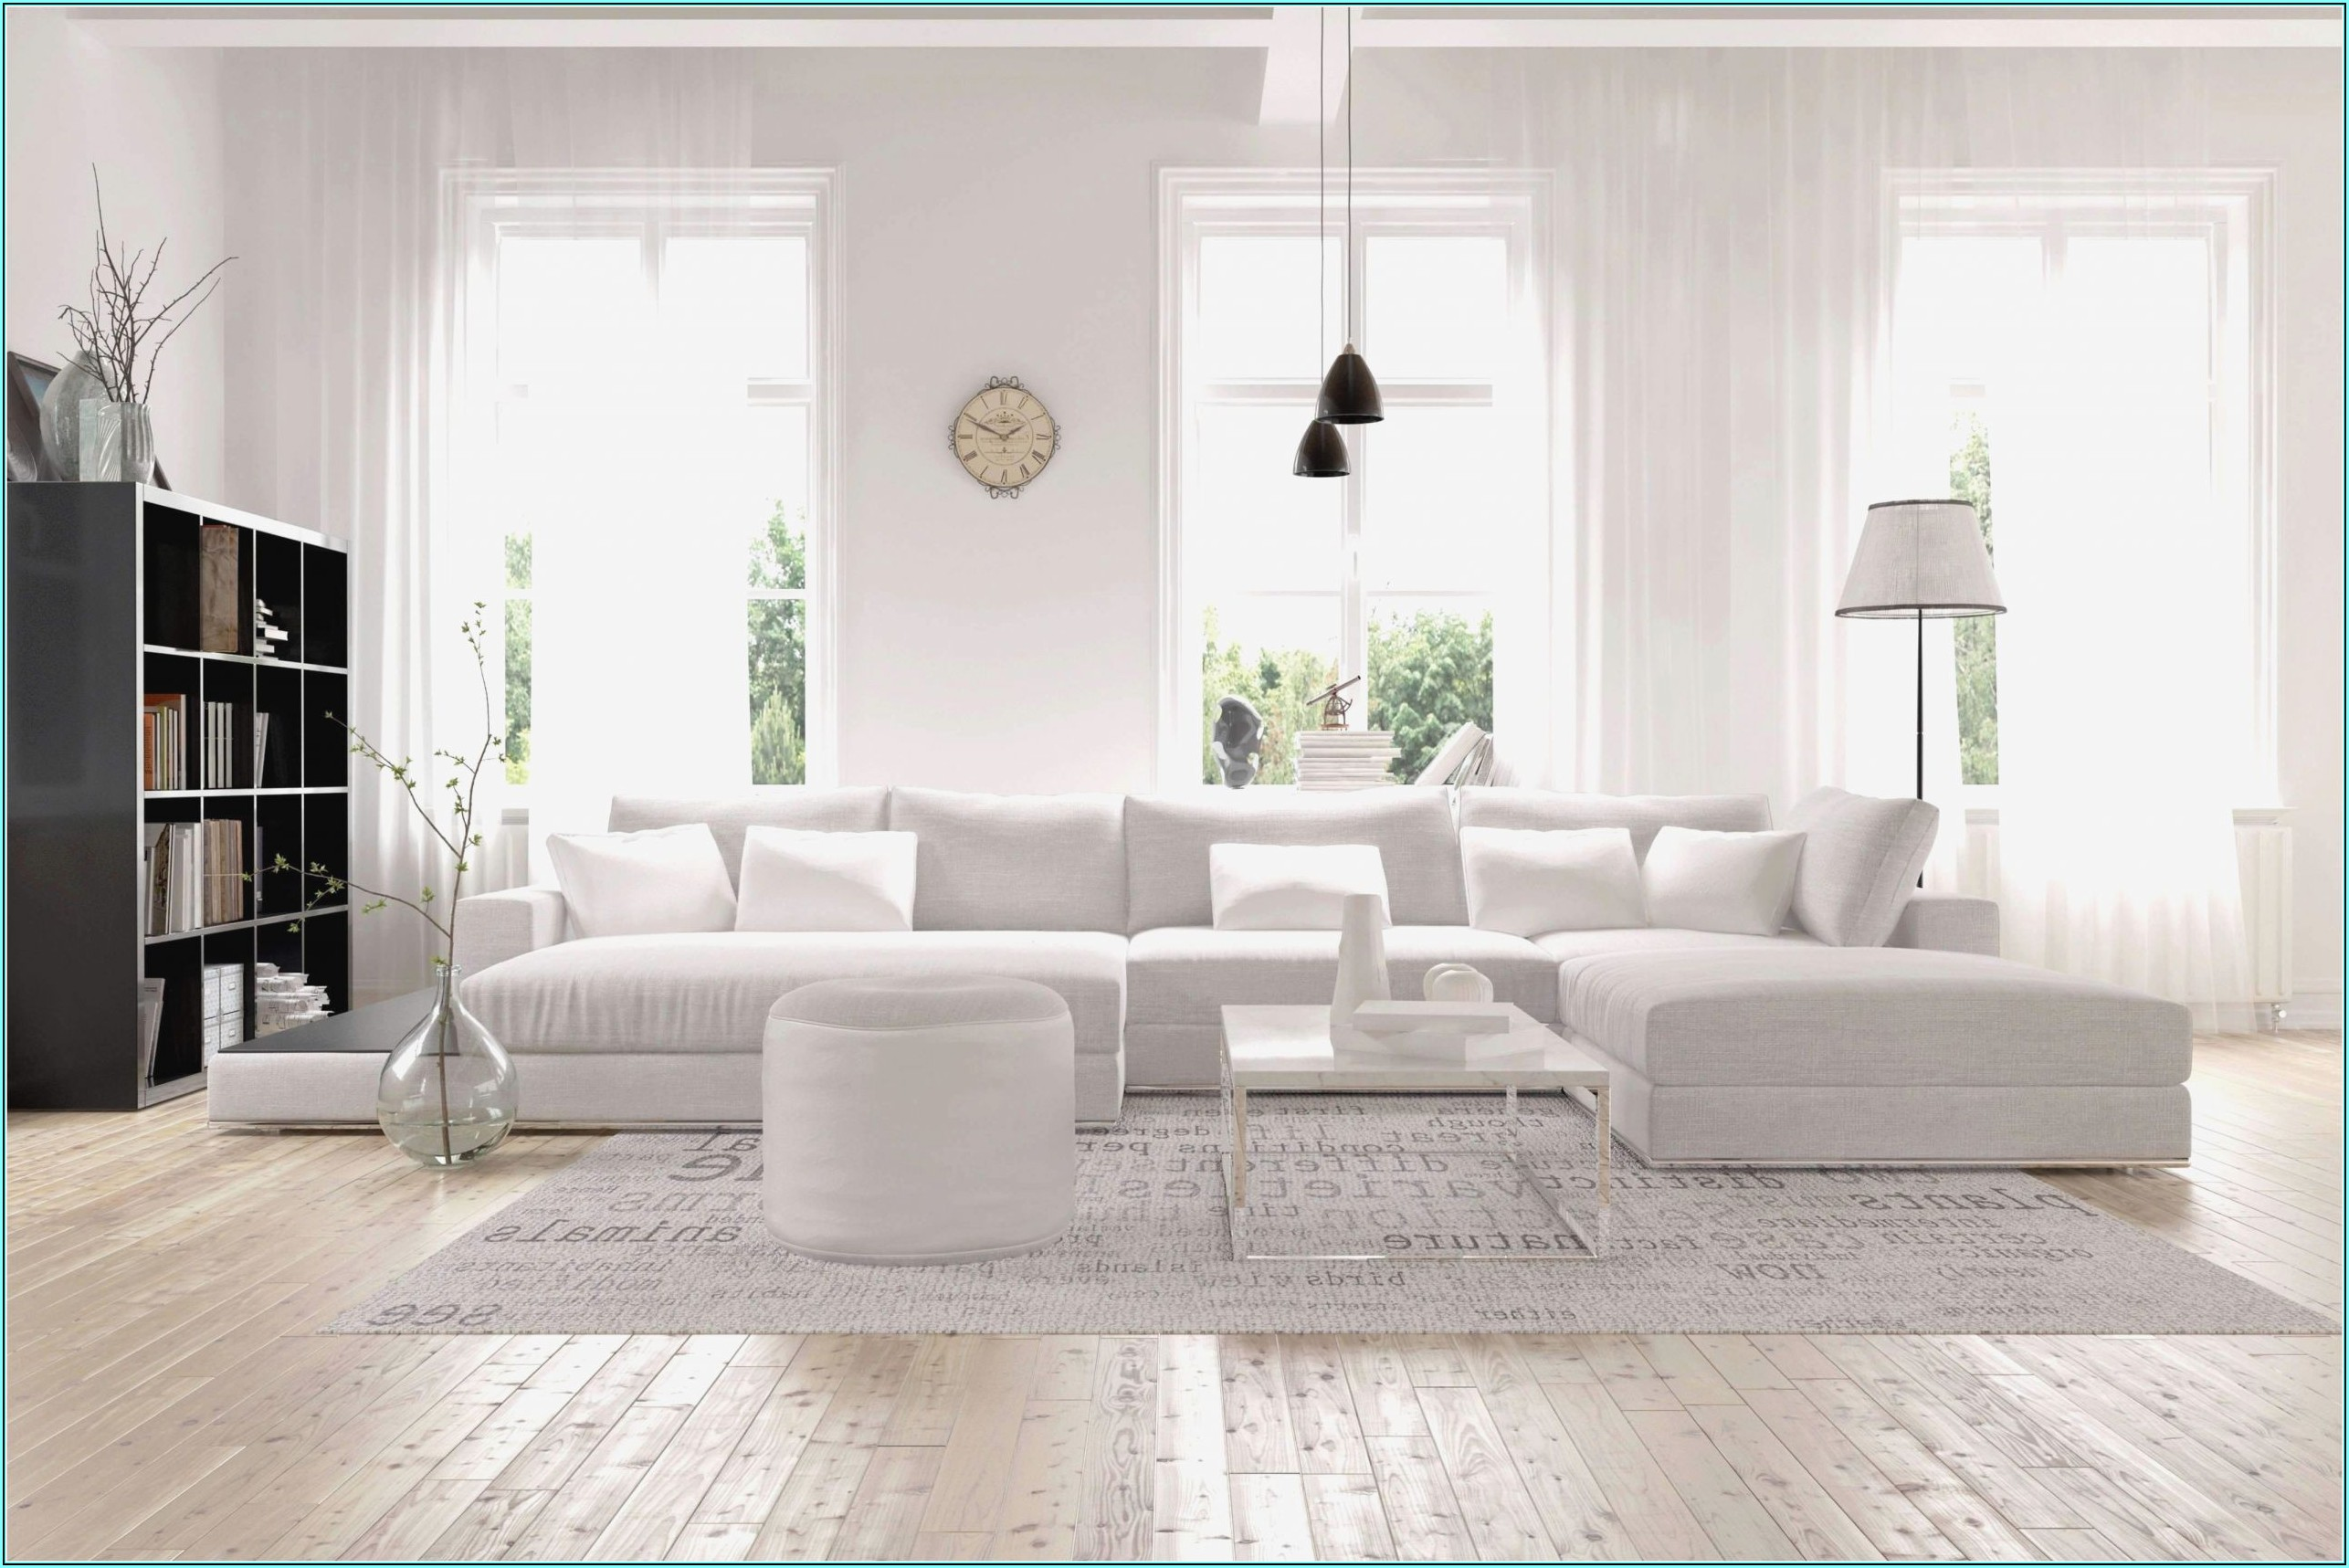 Wohnzimmer Ideen Heller Boden